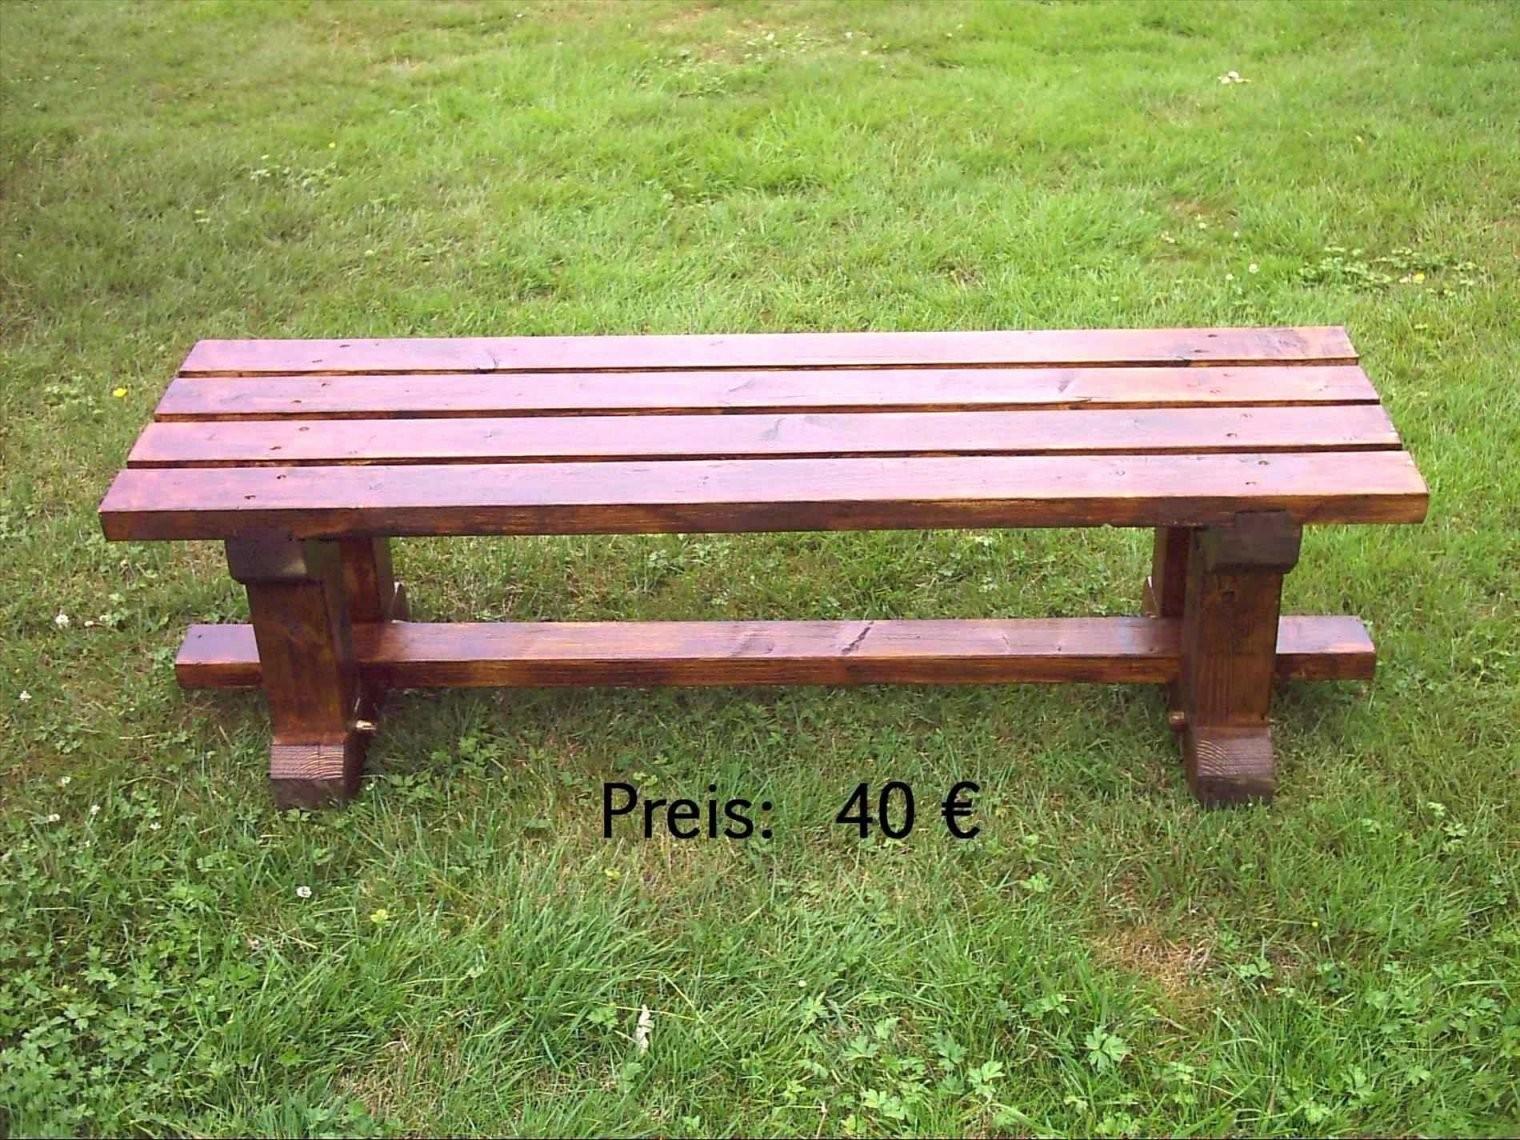 Sitzbank Holz Garten Inspirierend 36 Elegant Gartenbank Bauanleitung von Tisch Bank Kombination Bauanleitung Photo